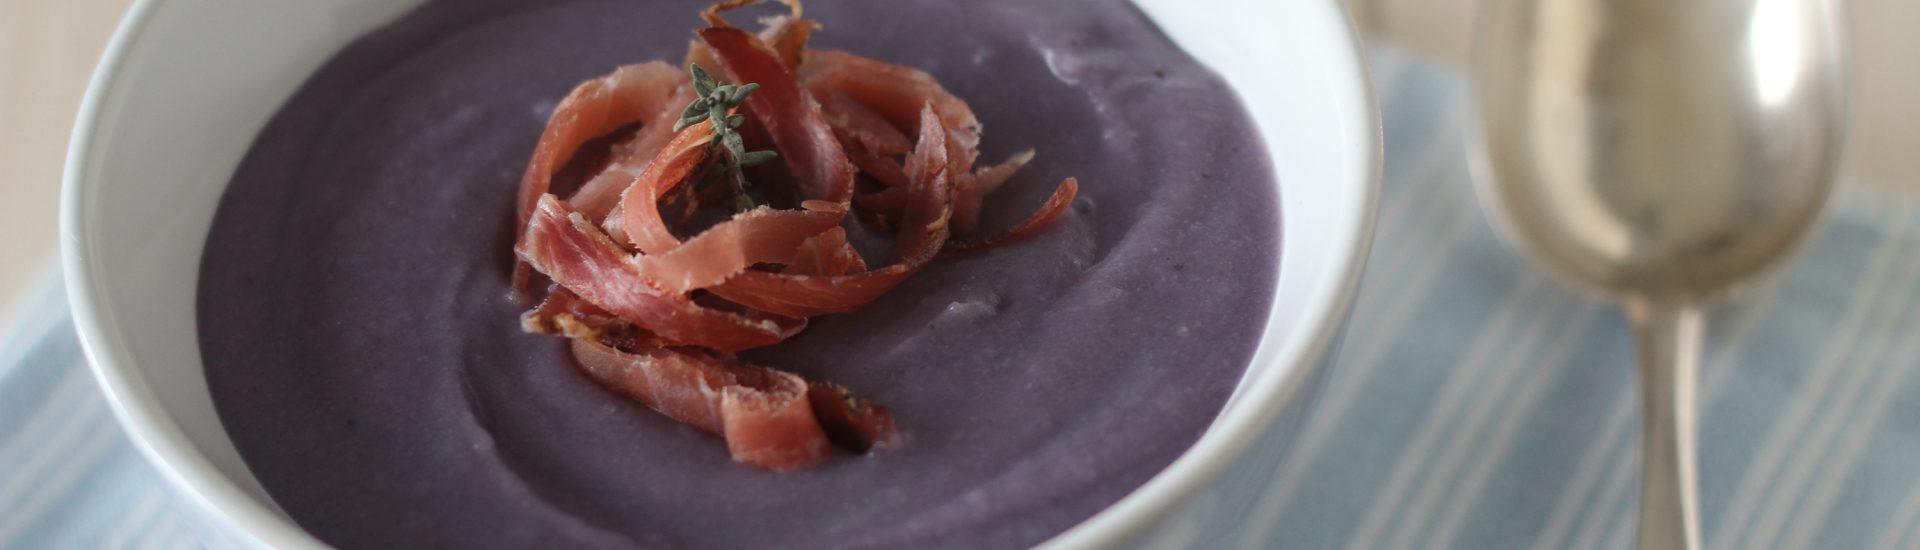 ricetta_vellutata_cavolfiore_e_patate